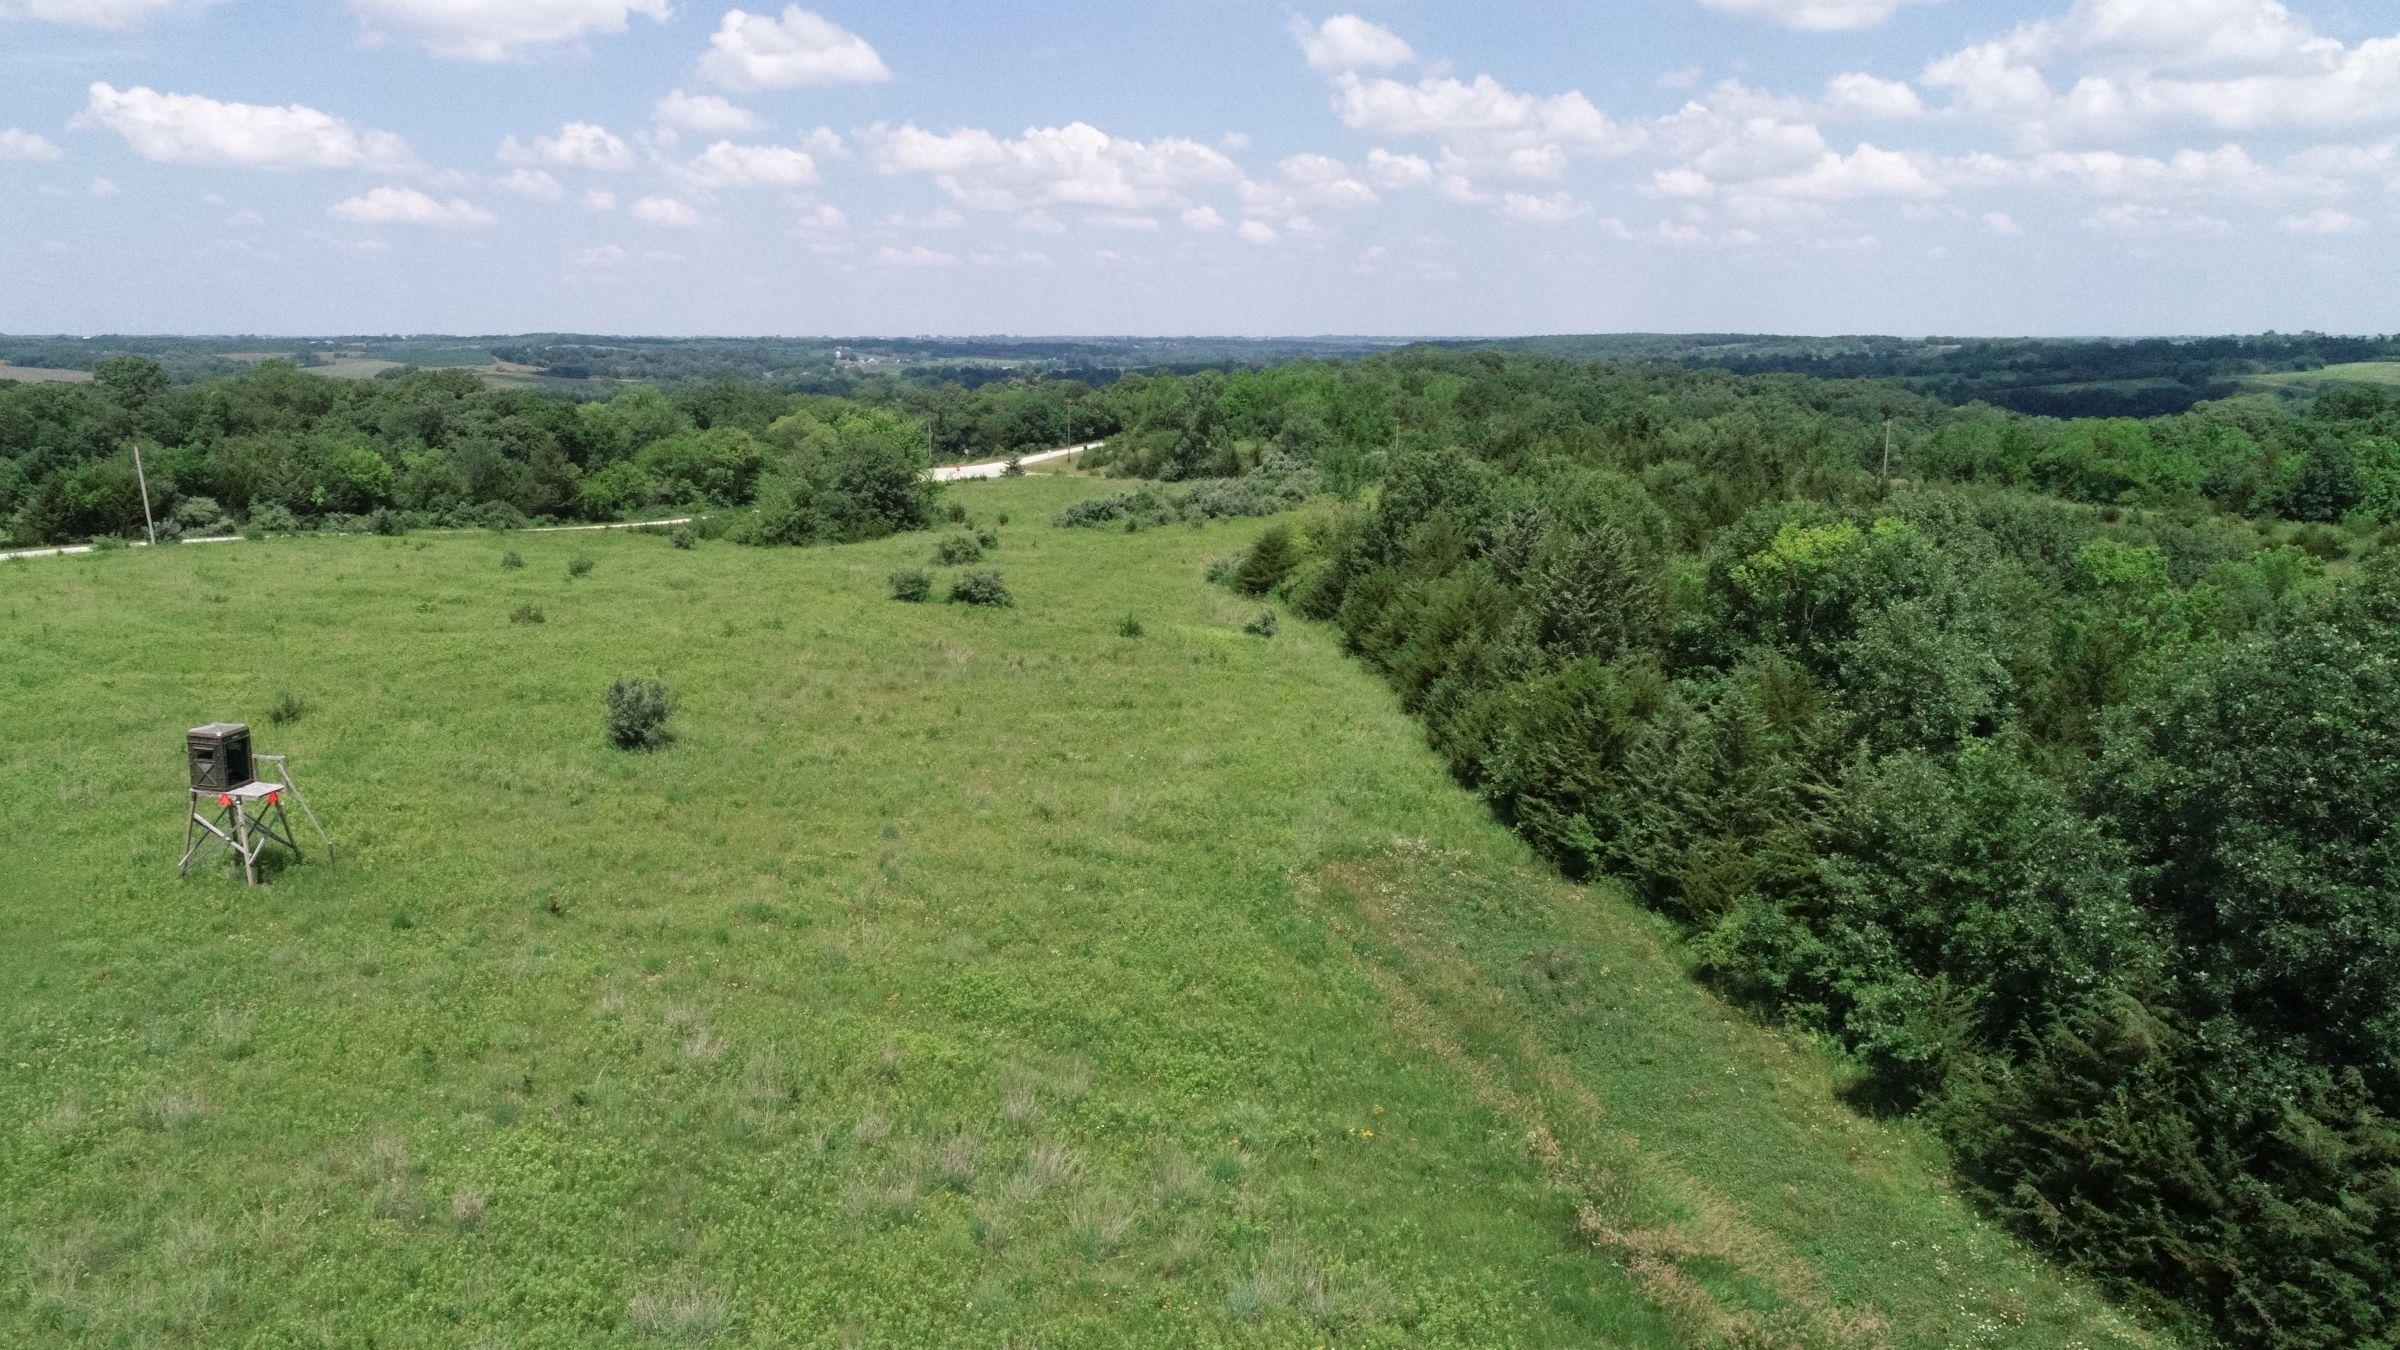 land-warren-county-iowa-29-acres-listing-number-15622-3-2021-07-02-190408.JPG